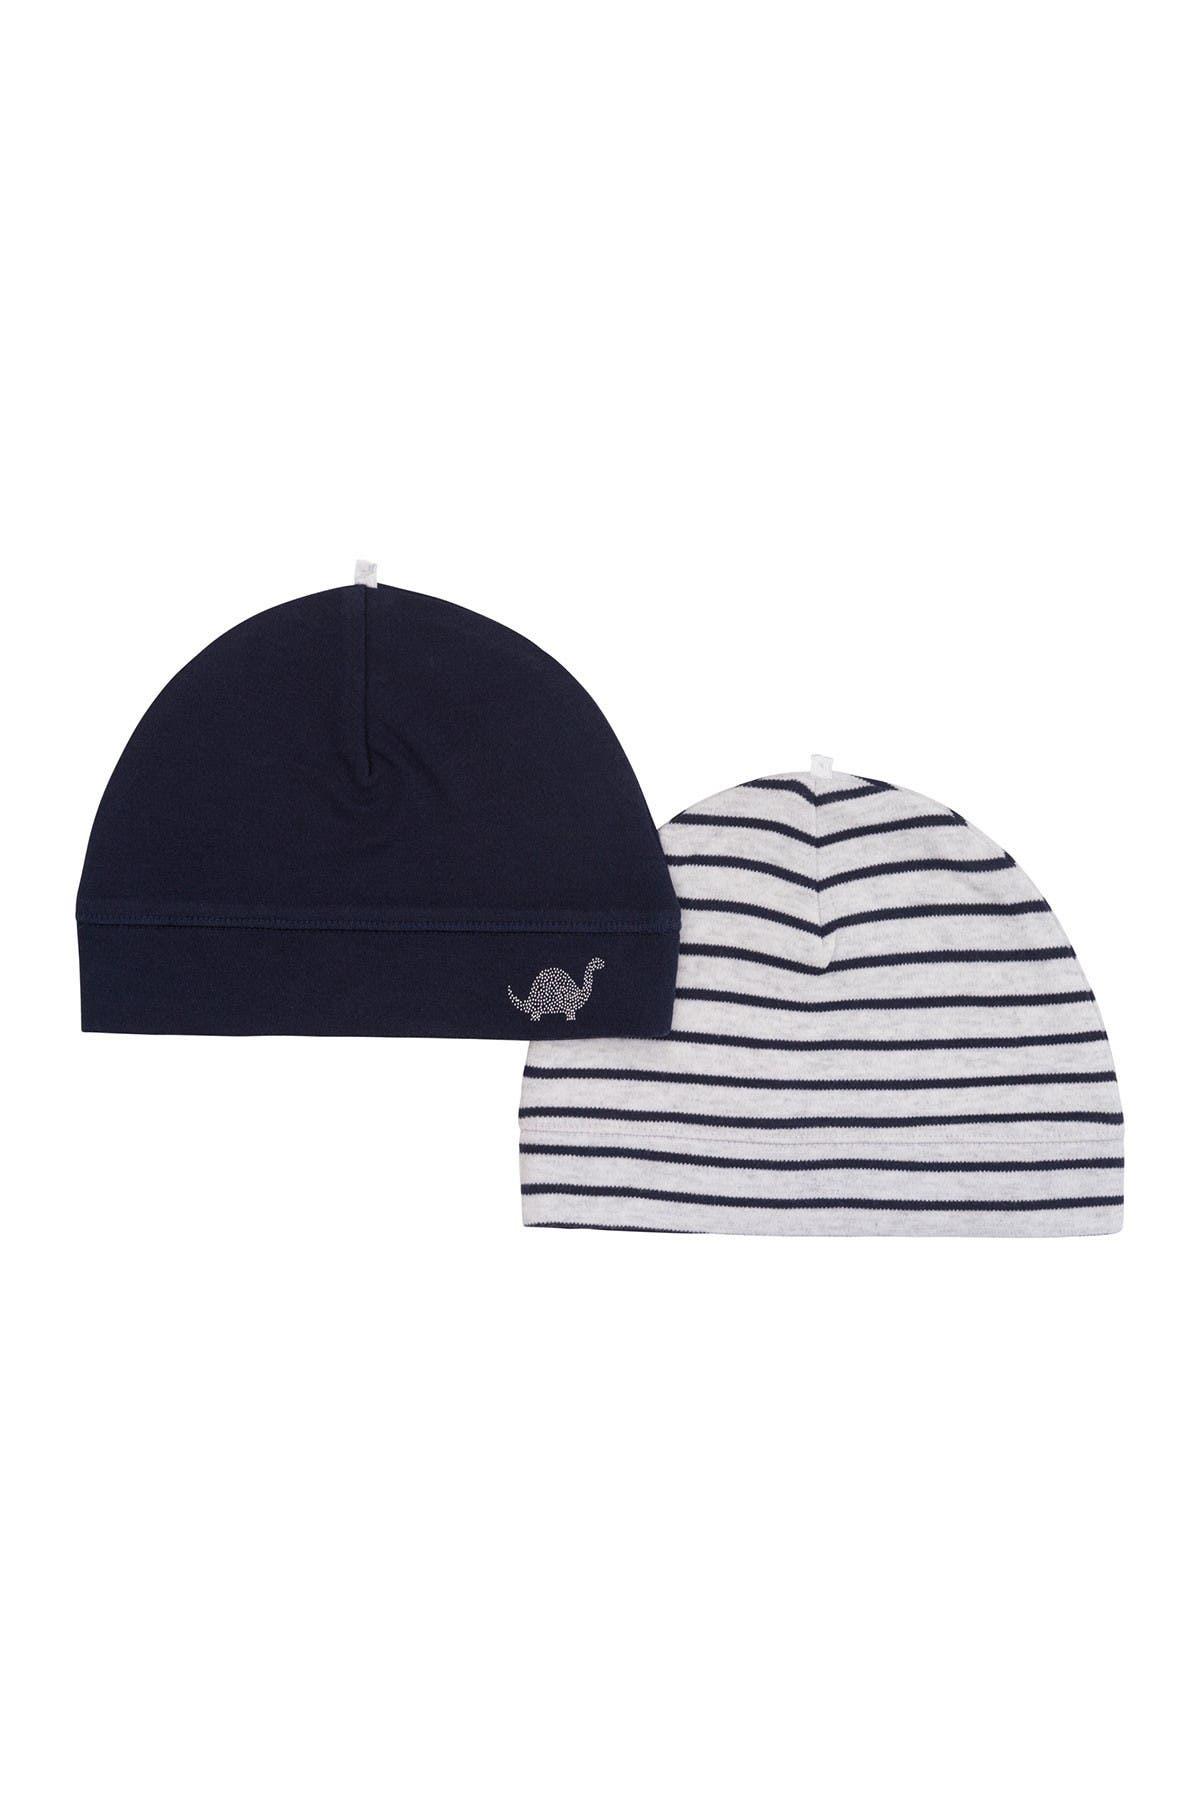 Image of Petit Lem Organic Baby Hats - Pack of 2